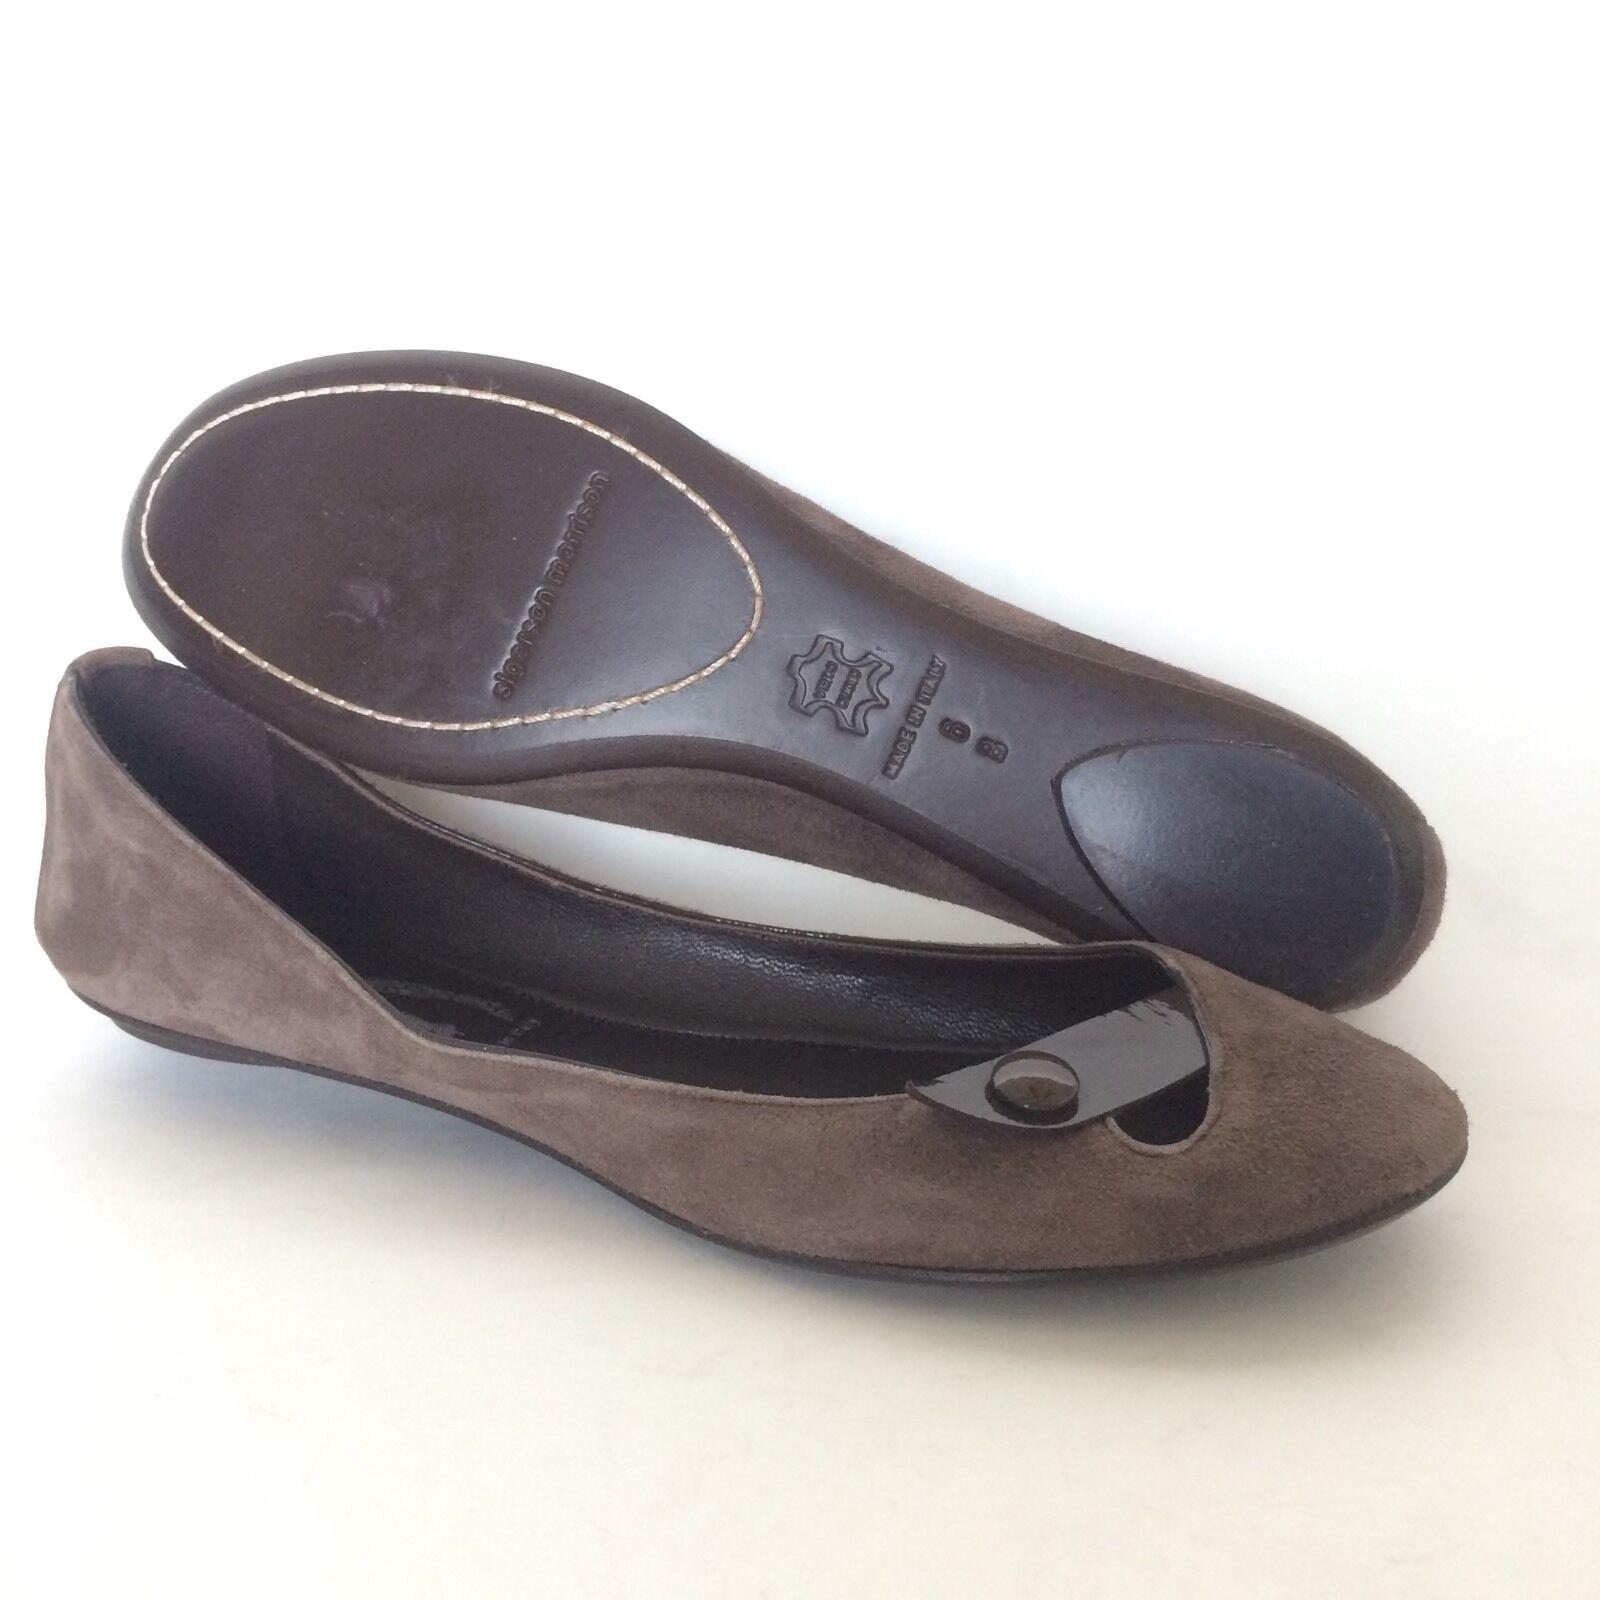 Belle Sigerson Sigerson Sigerson Morrison Womens Brown Suede Leather Ballet Flats Size 6  8ef741